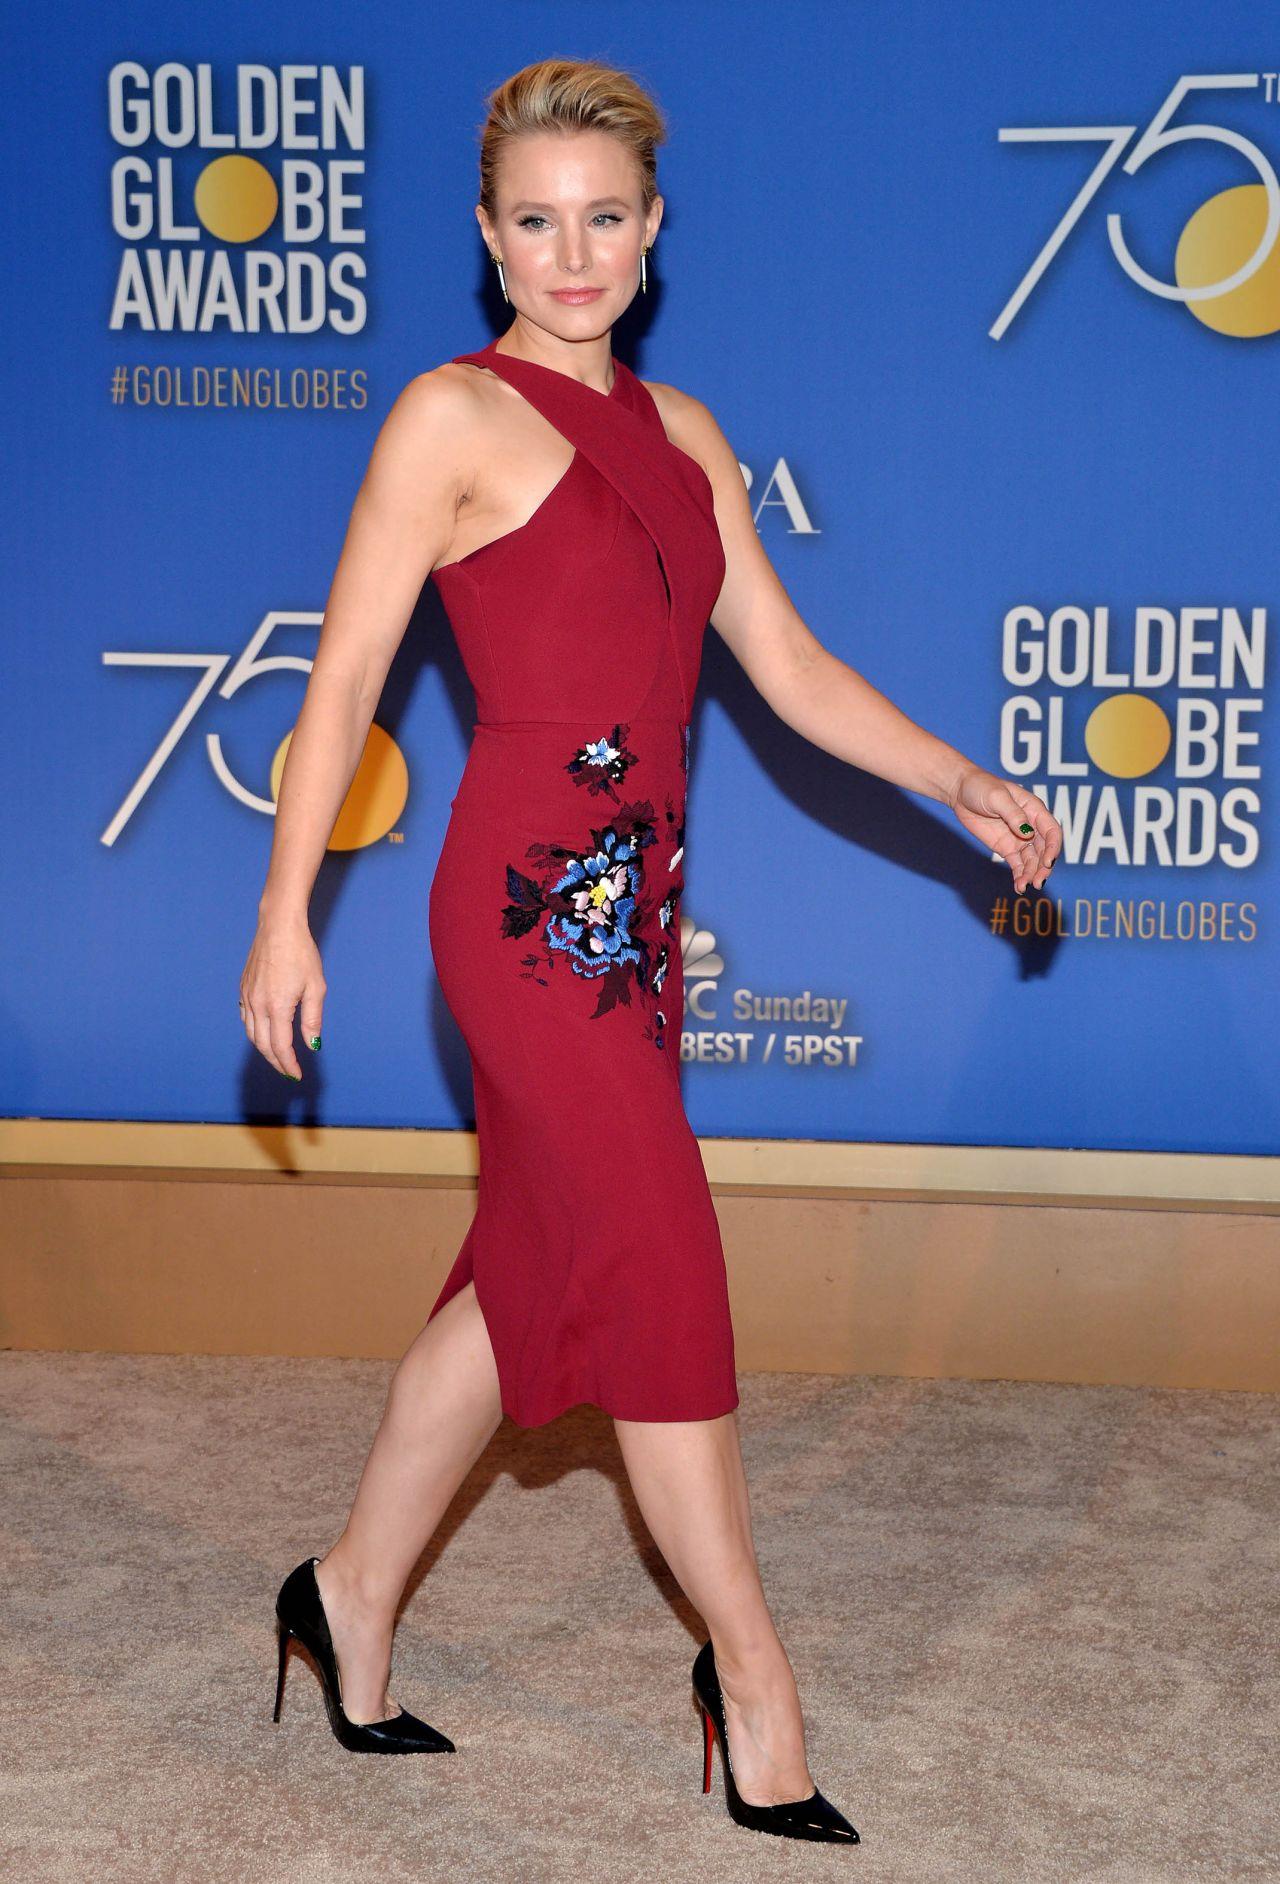 http://celebmafia.com/wp-content/uploads/2017/12/kristen-bell-golden-globe-awards-2017-nomination-announcement-in-la-10.jpg